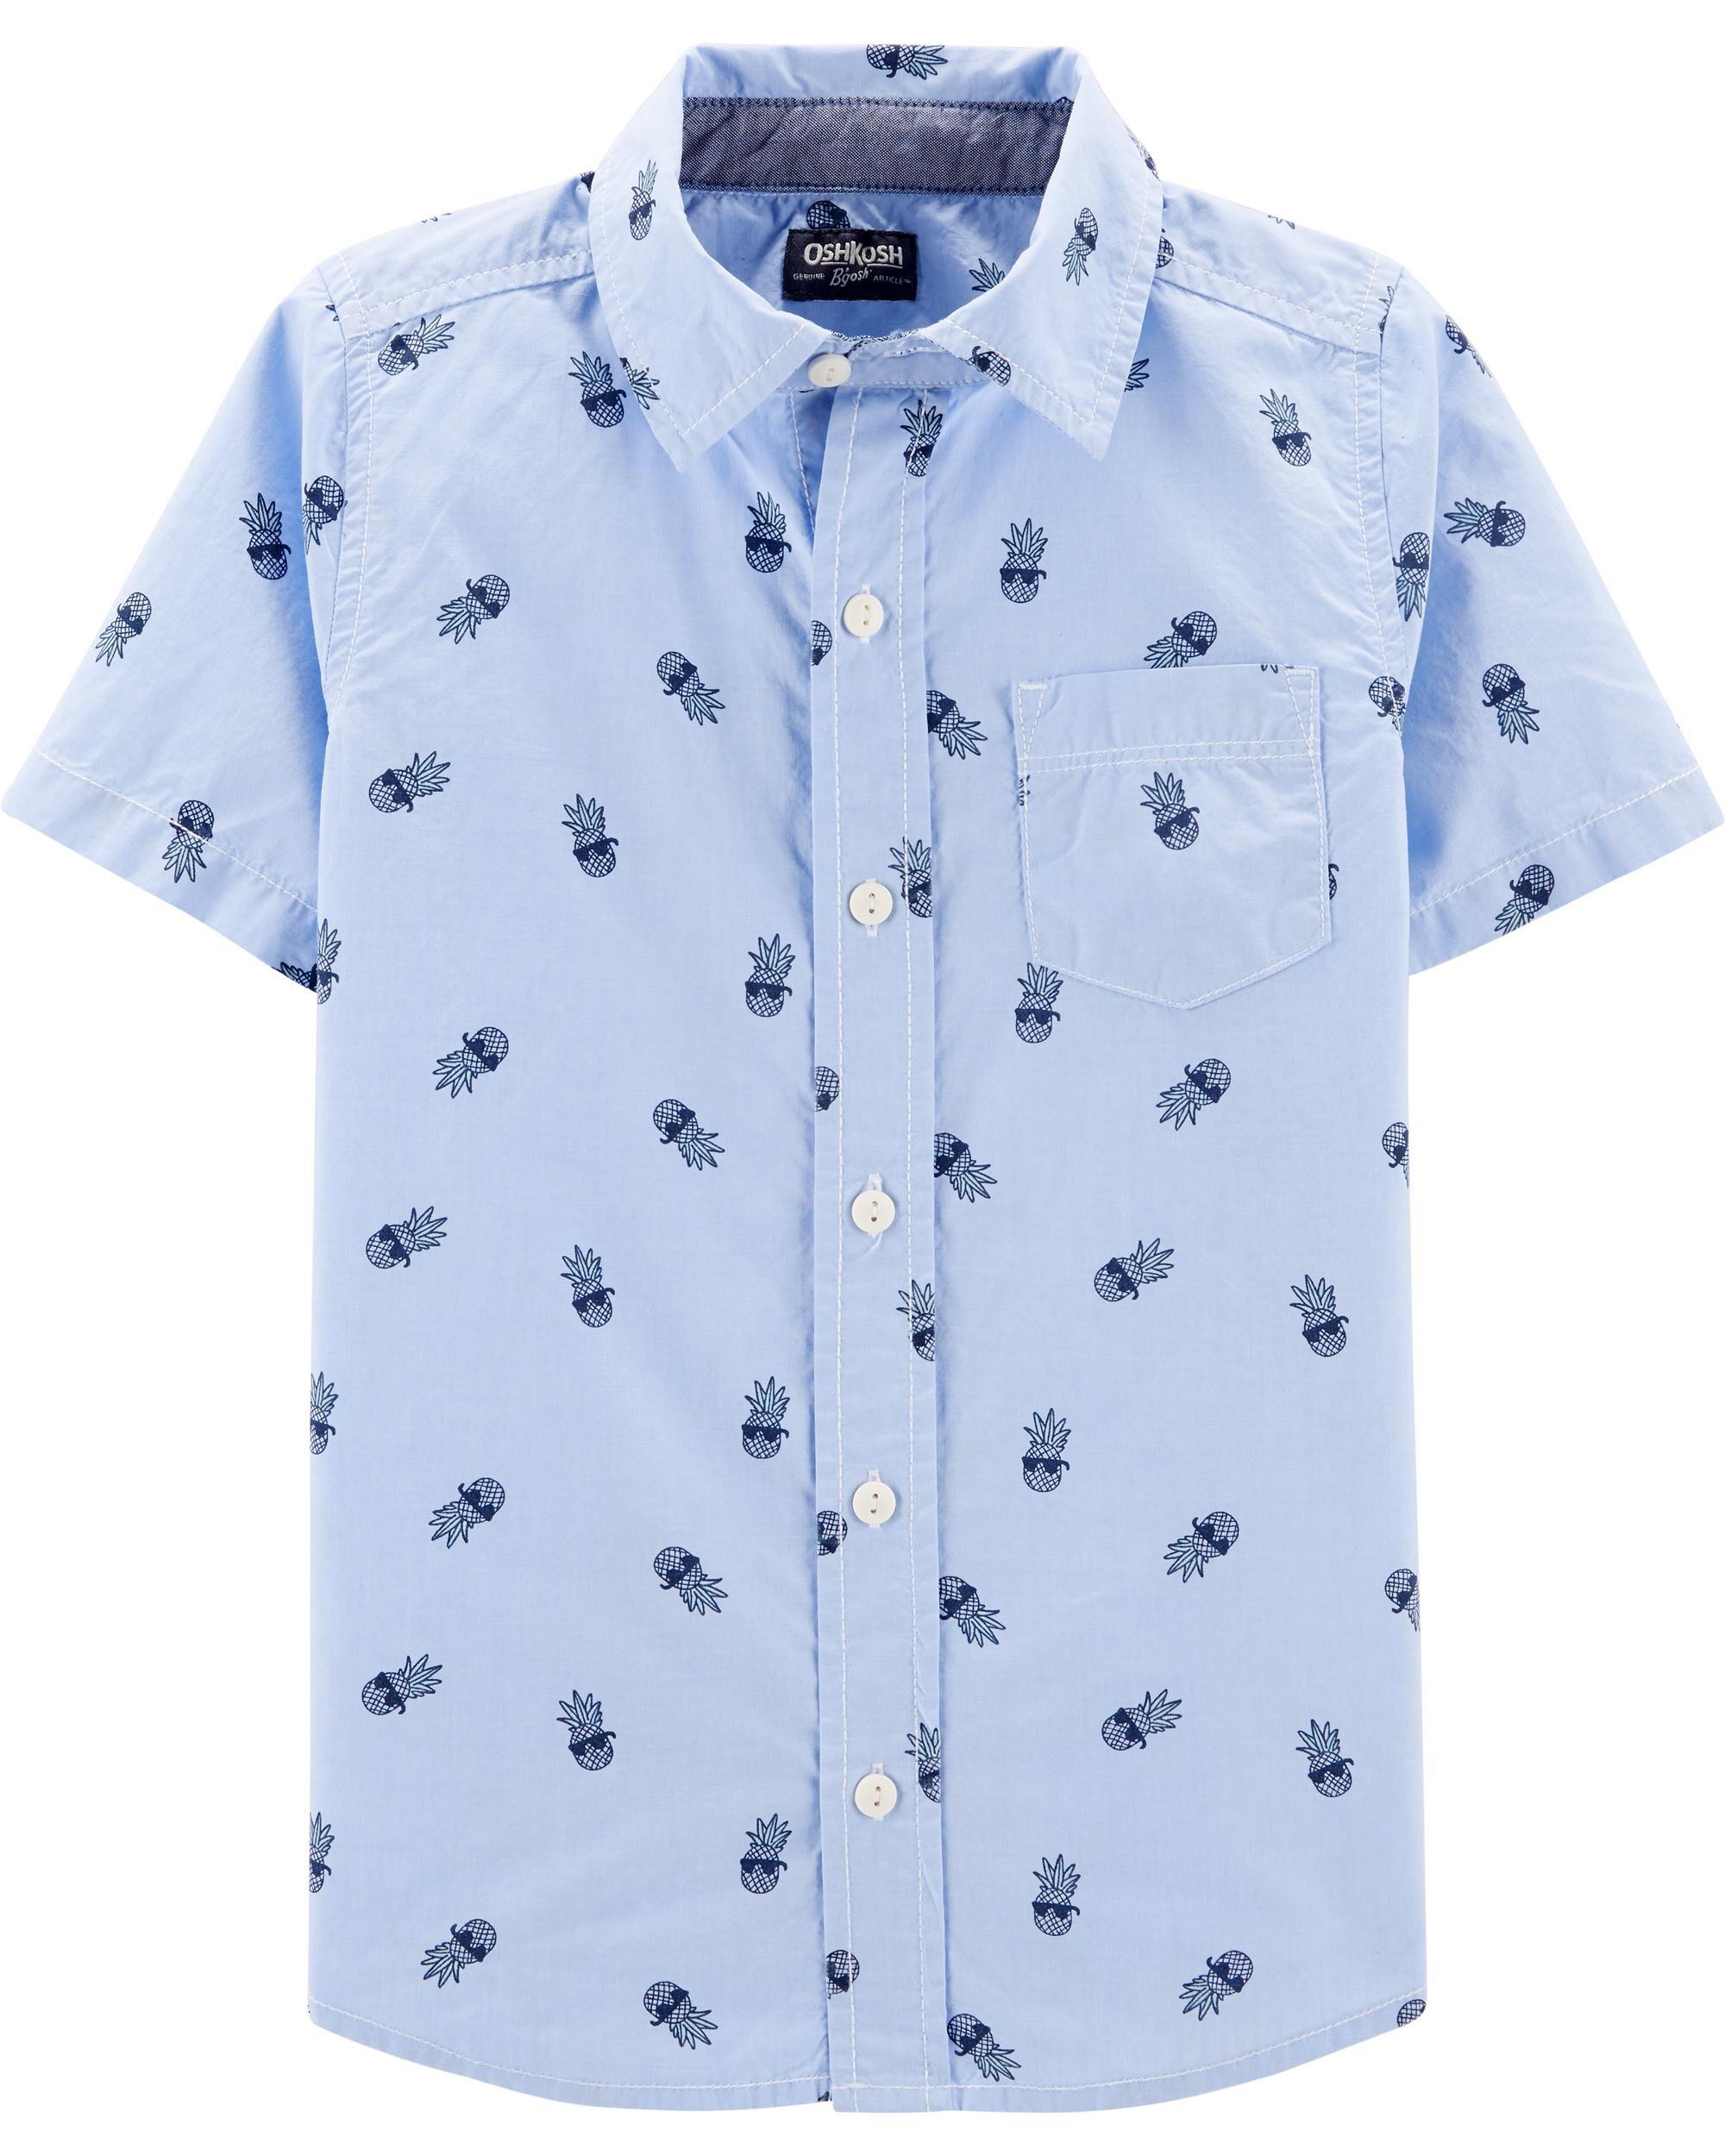 7c742c5978 Pineapple Button-Front Shirt